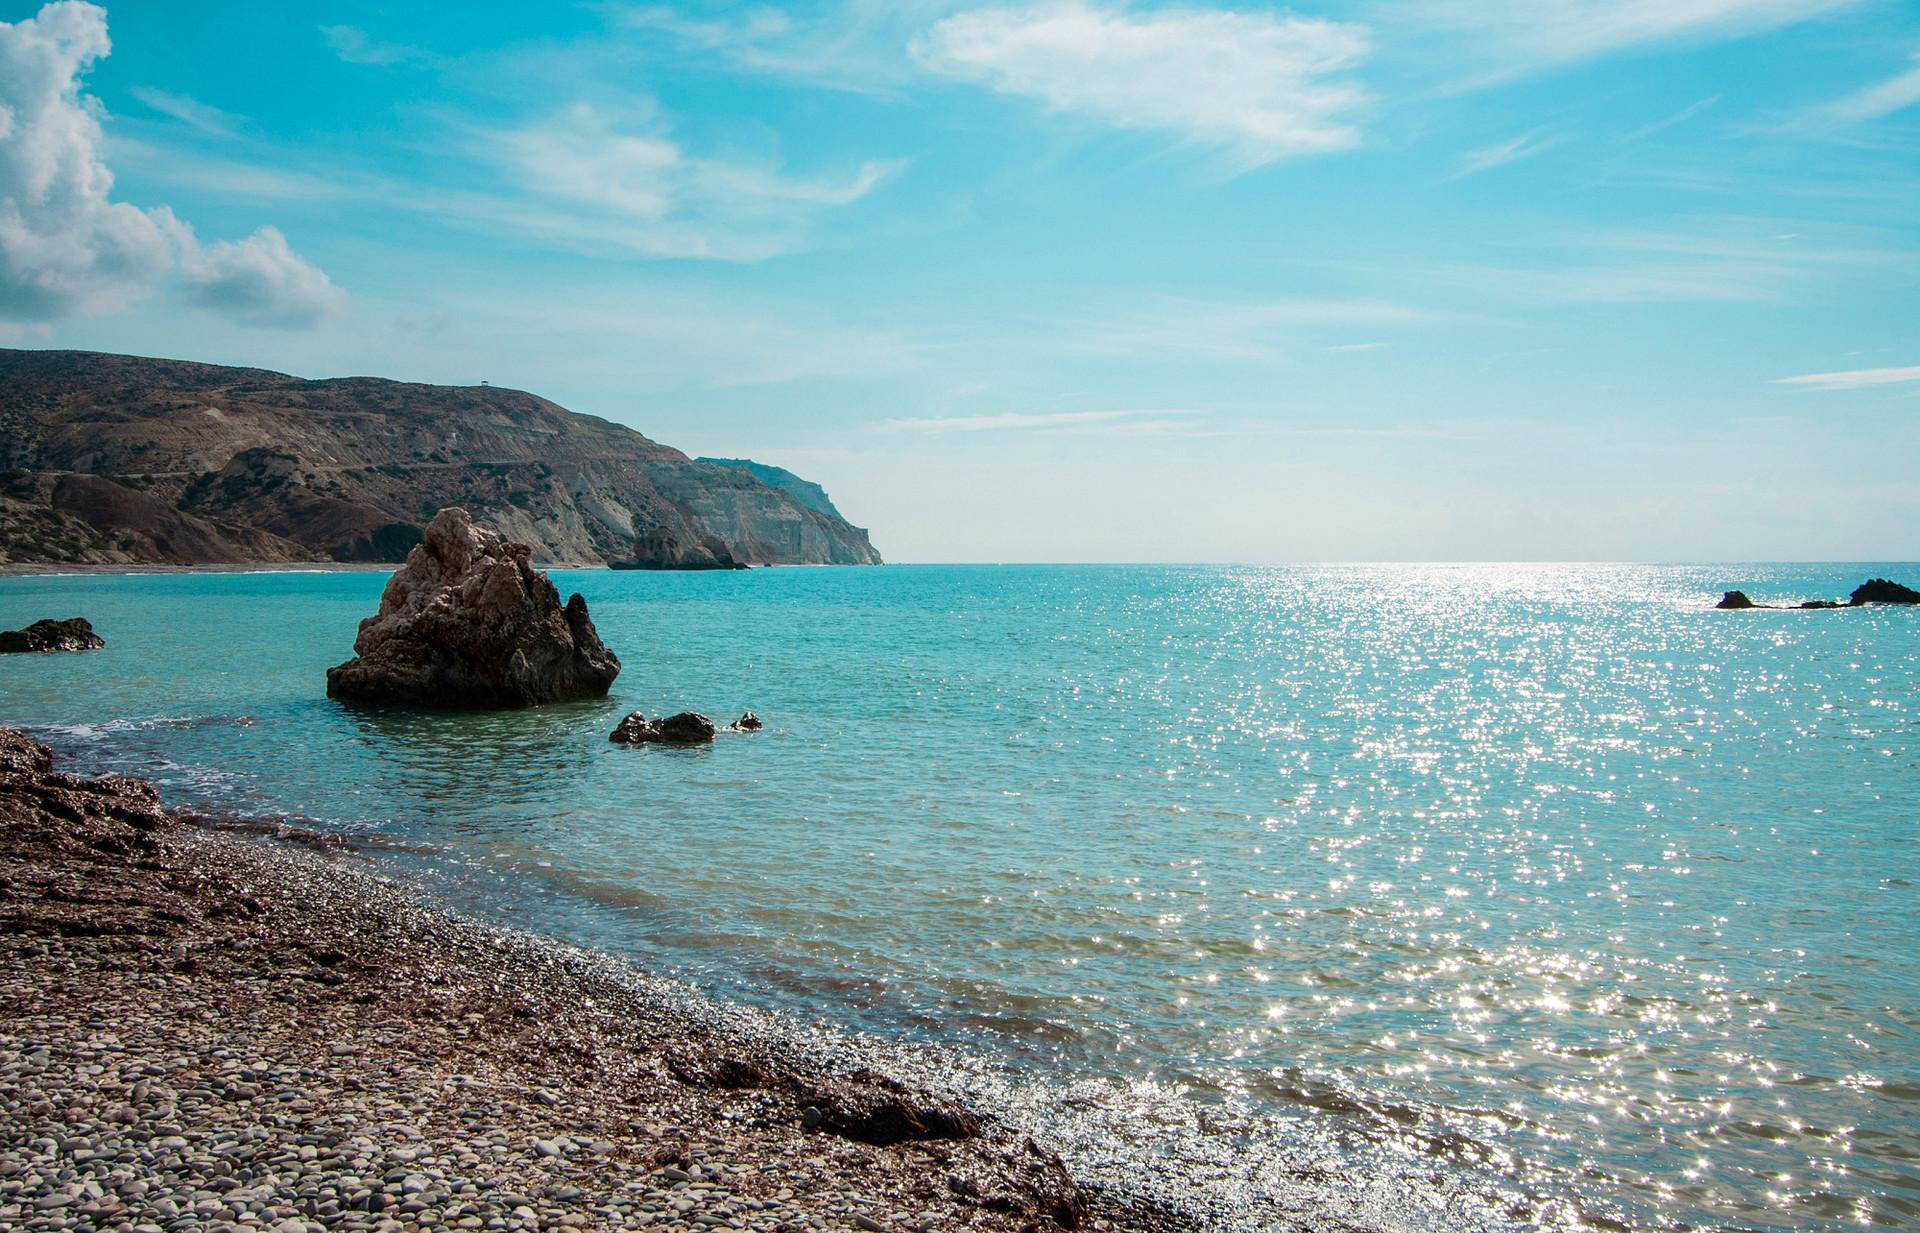 Cyprus blauwe zee met rots en kiezelstrand